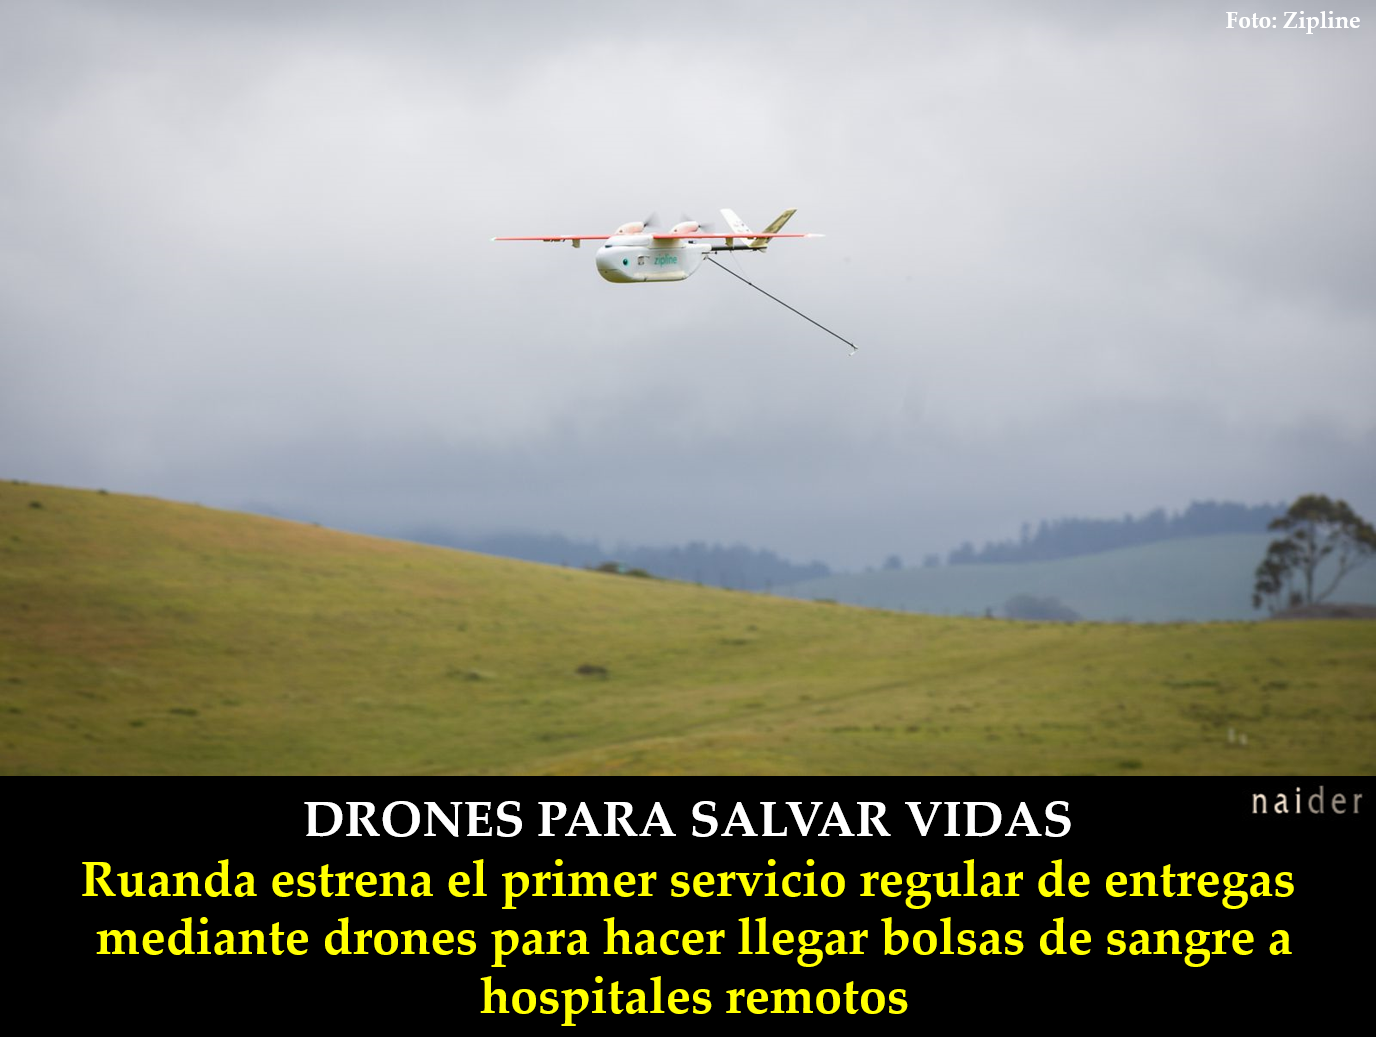 drones-para-salvar-vidas